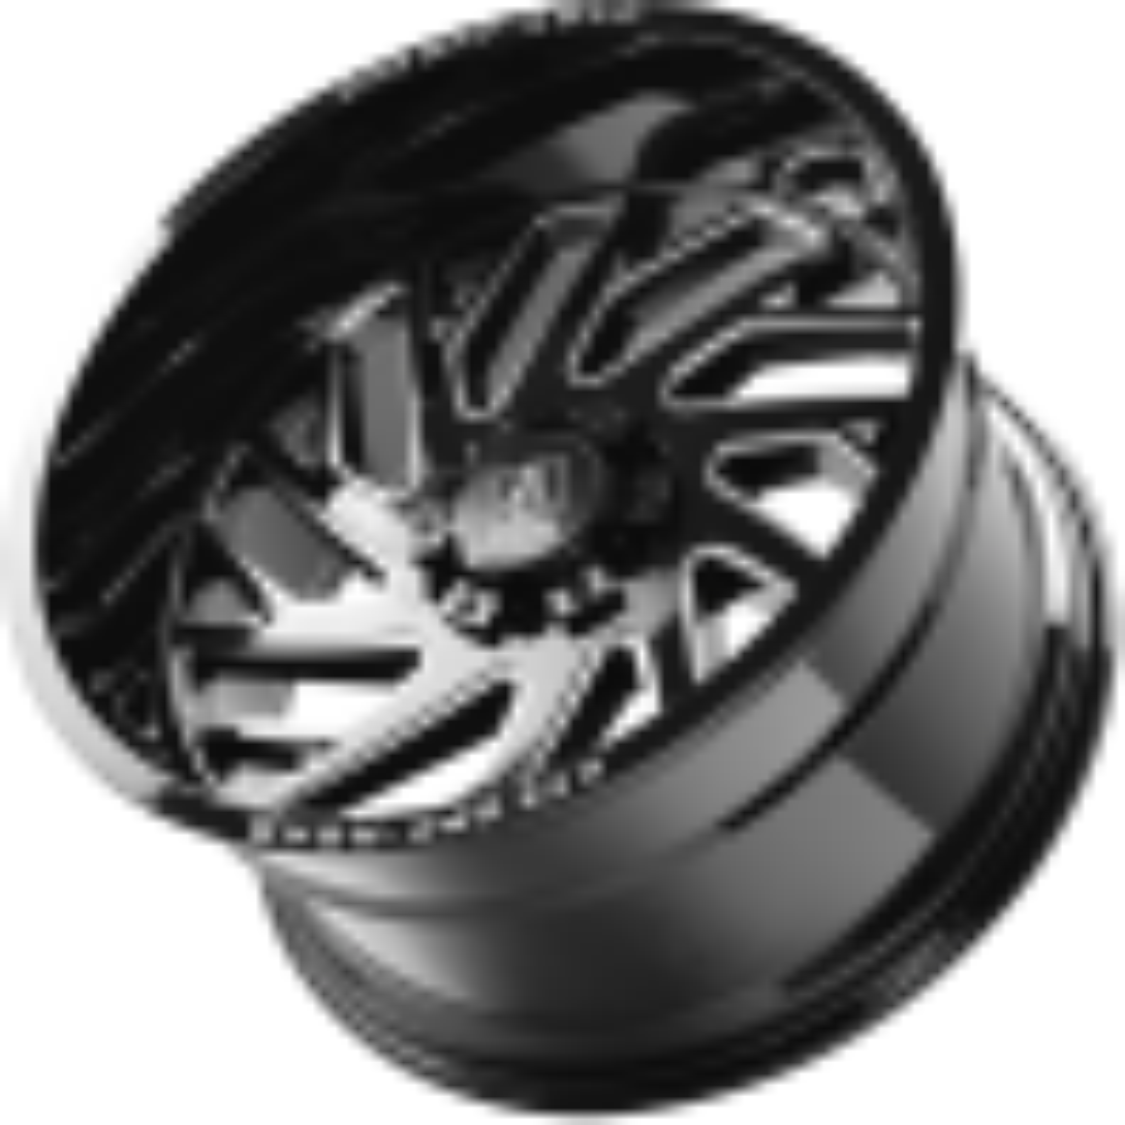 AXE Wheels Gloss Black - Milled Edge